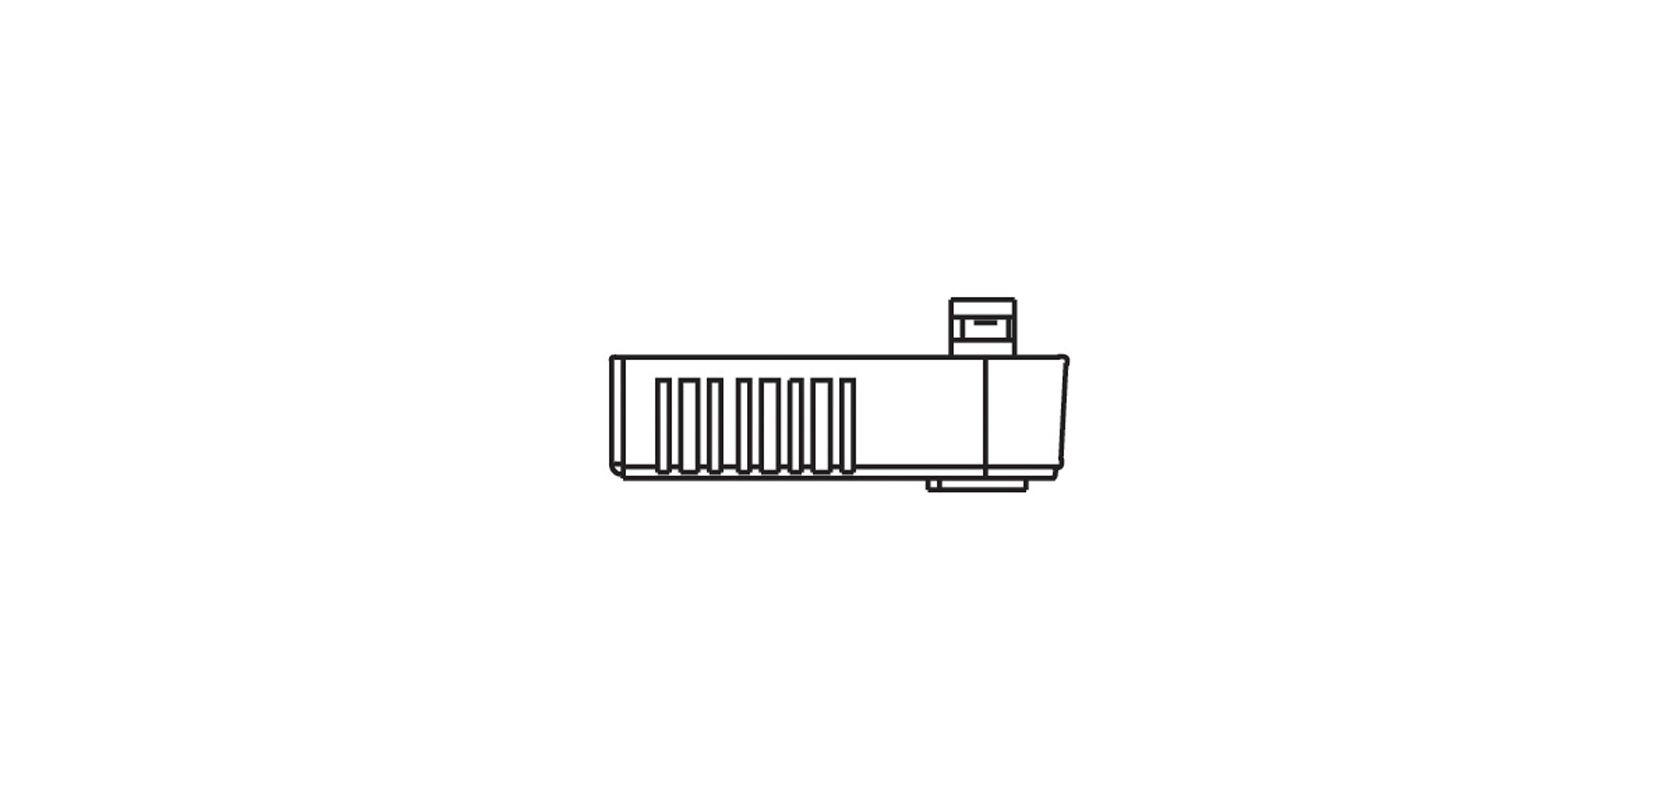 Elco ELW 50W Track Transformer for Low Voltage Pendants Black Indoor